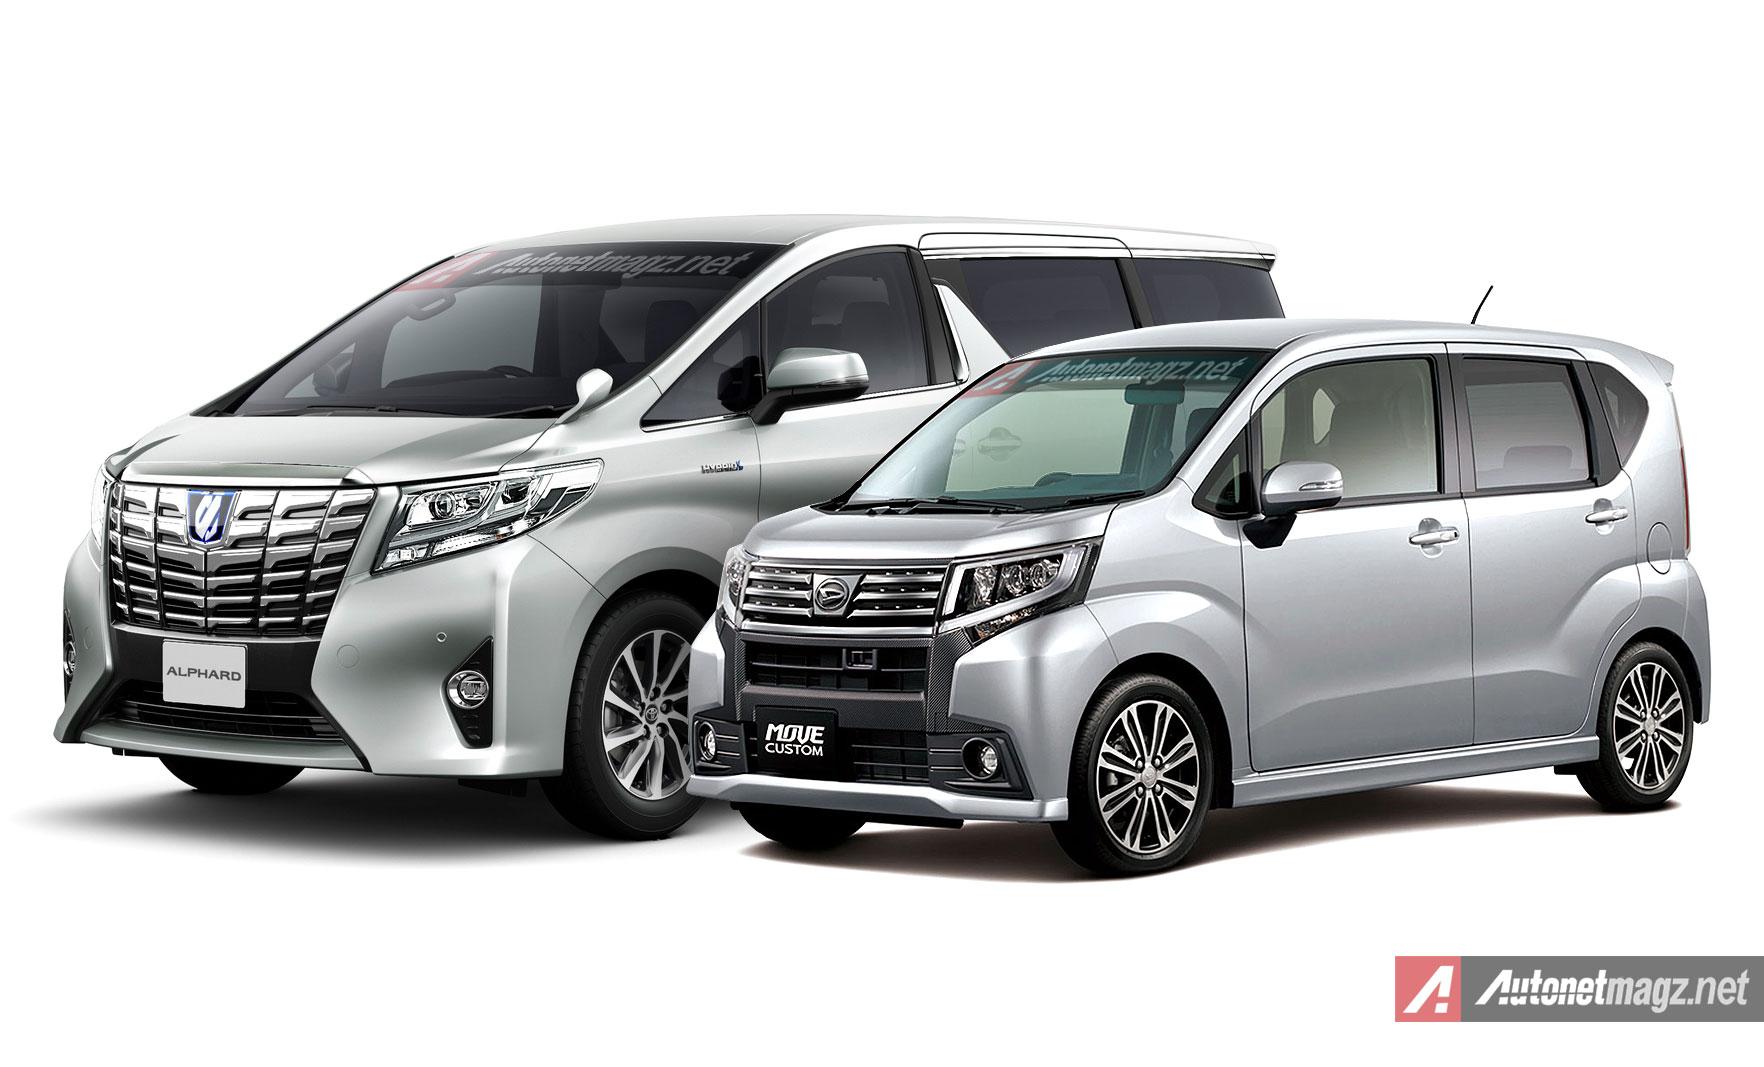 Daihatsu Move Custom 2015 Wajahnya Mirip Alphard Mini